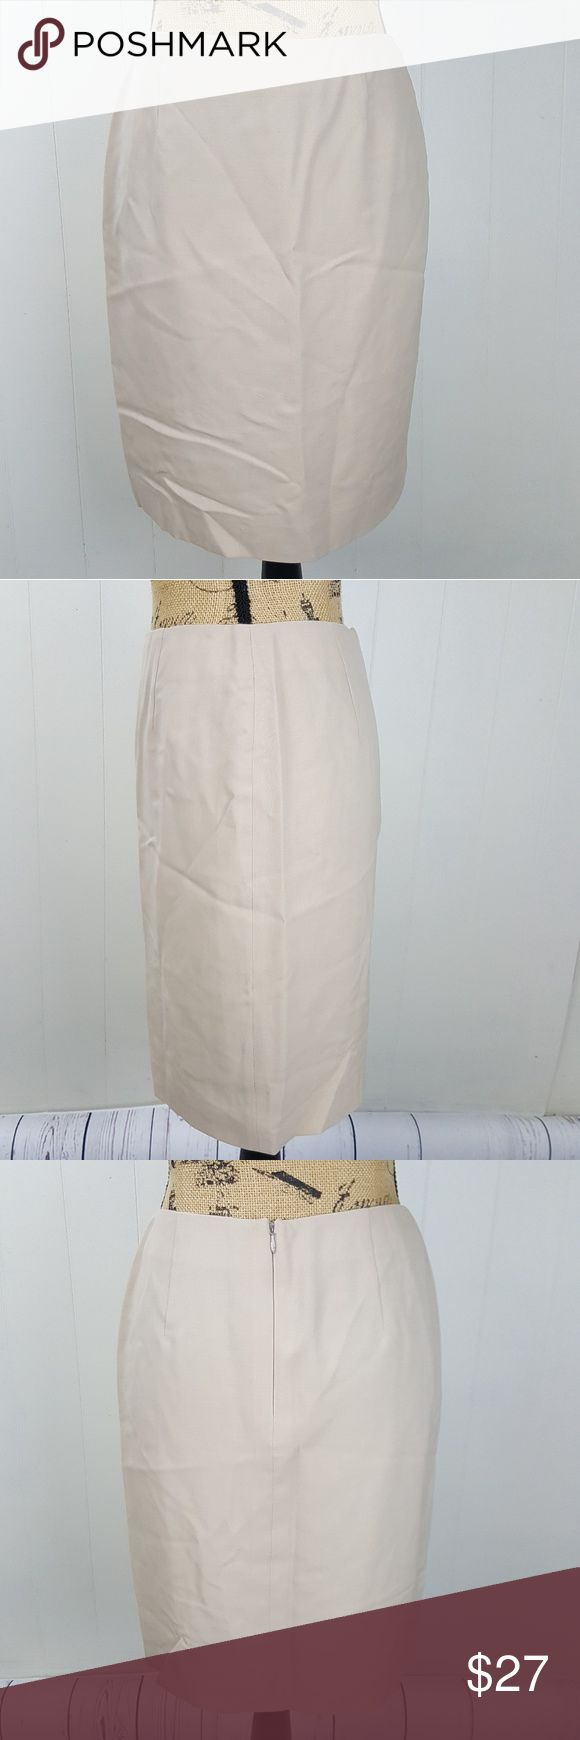 "Ralph Lauren Wool Tan Pencil Skirt Black Label 6 BRAND: Ralph Lauren  Size: 6   Condition: Very Good   Measurements:  Across 14""  Long (Waist to Bottom) 20-3/8""   Color: Tan   Material: 100% Wool Ralph Lauren Black Label Skirts Pencil"